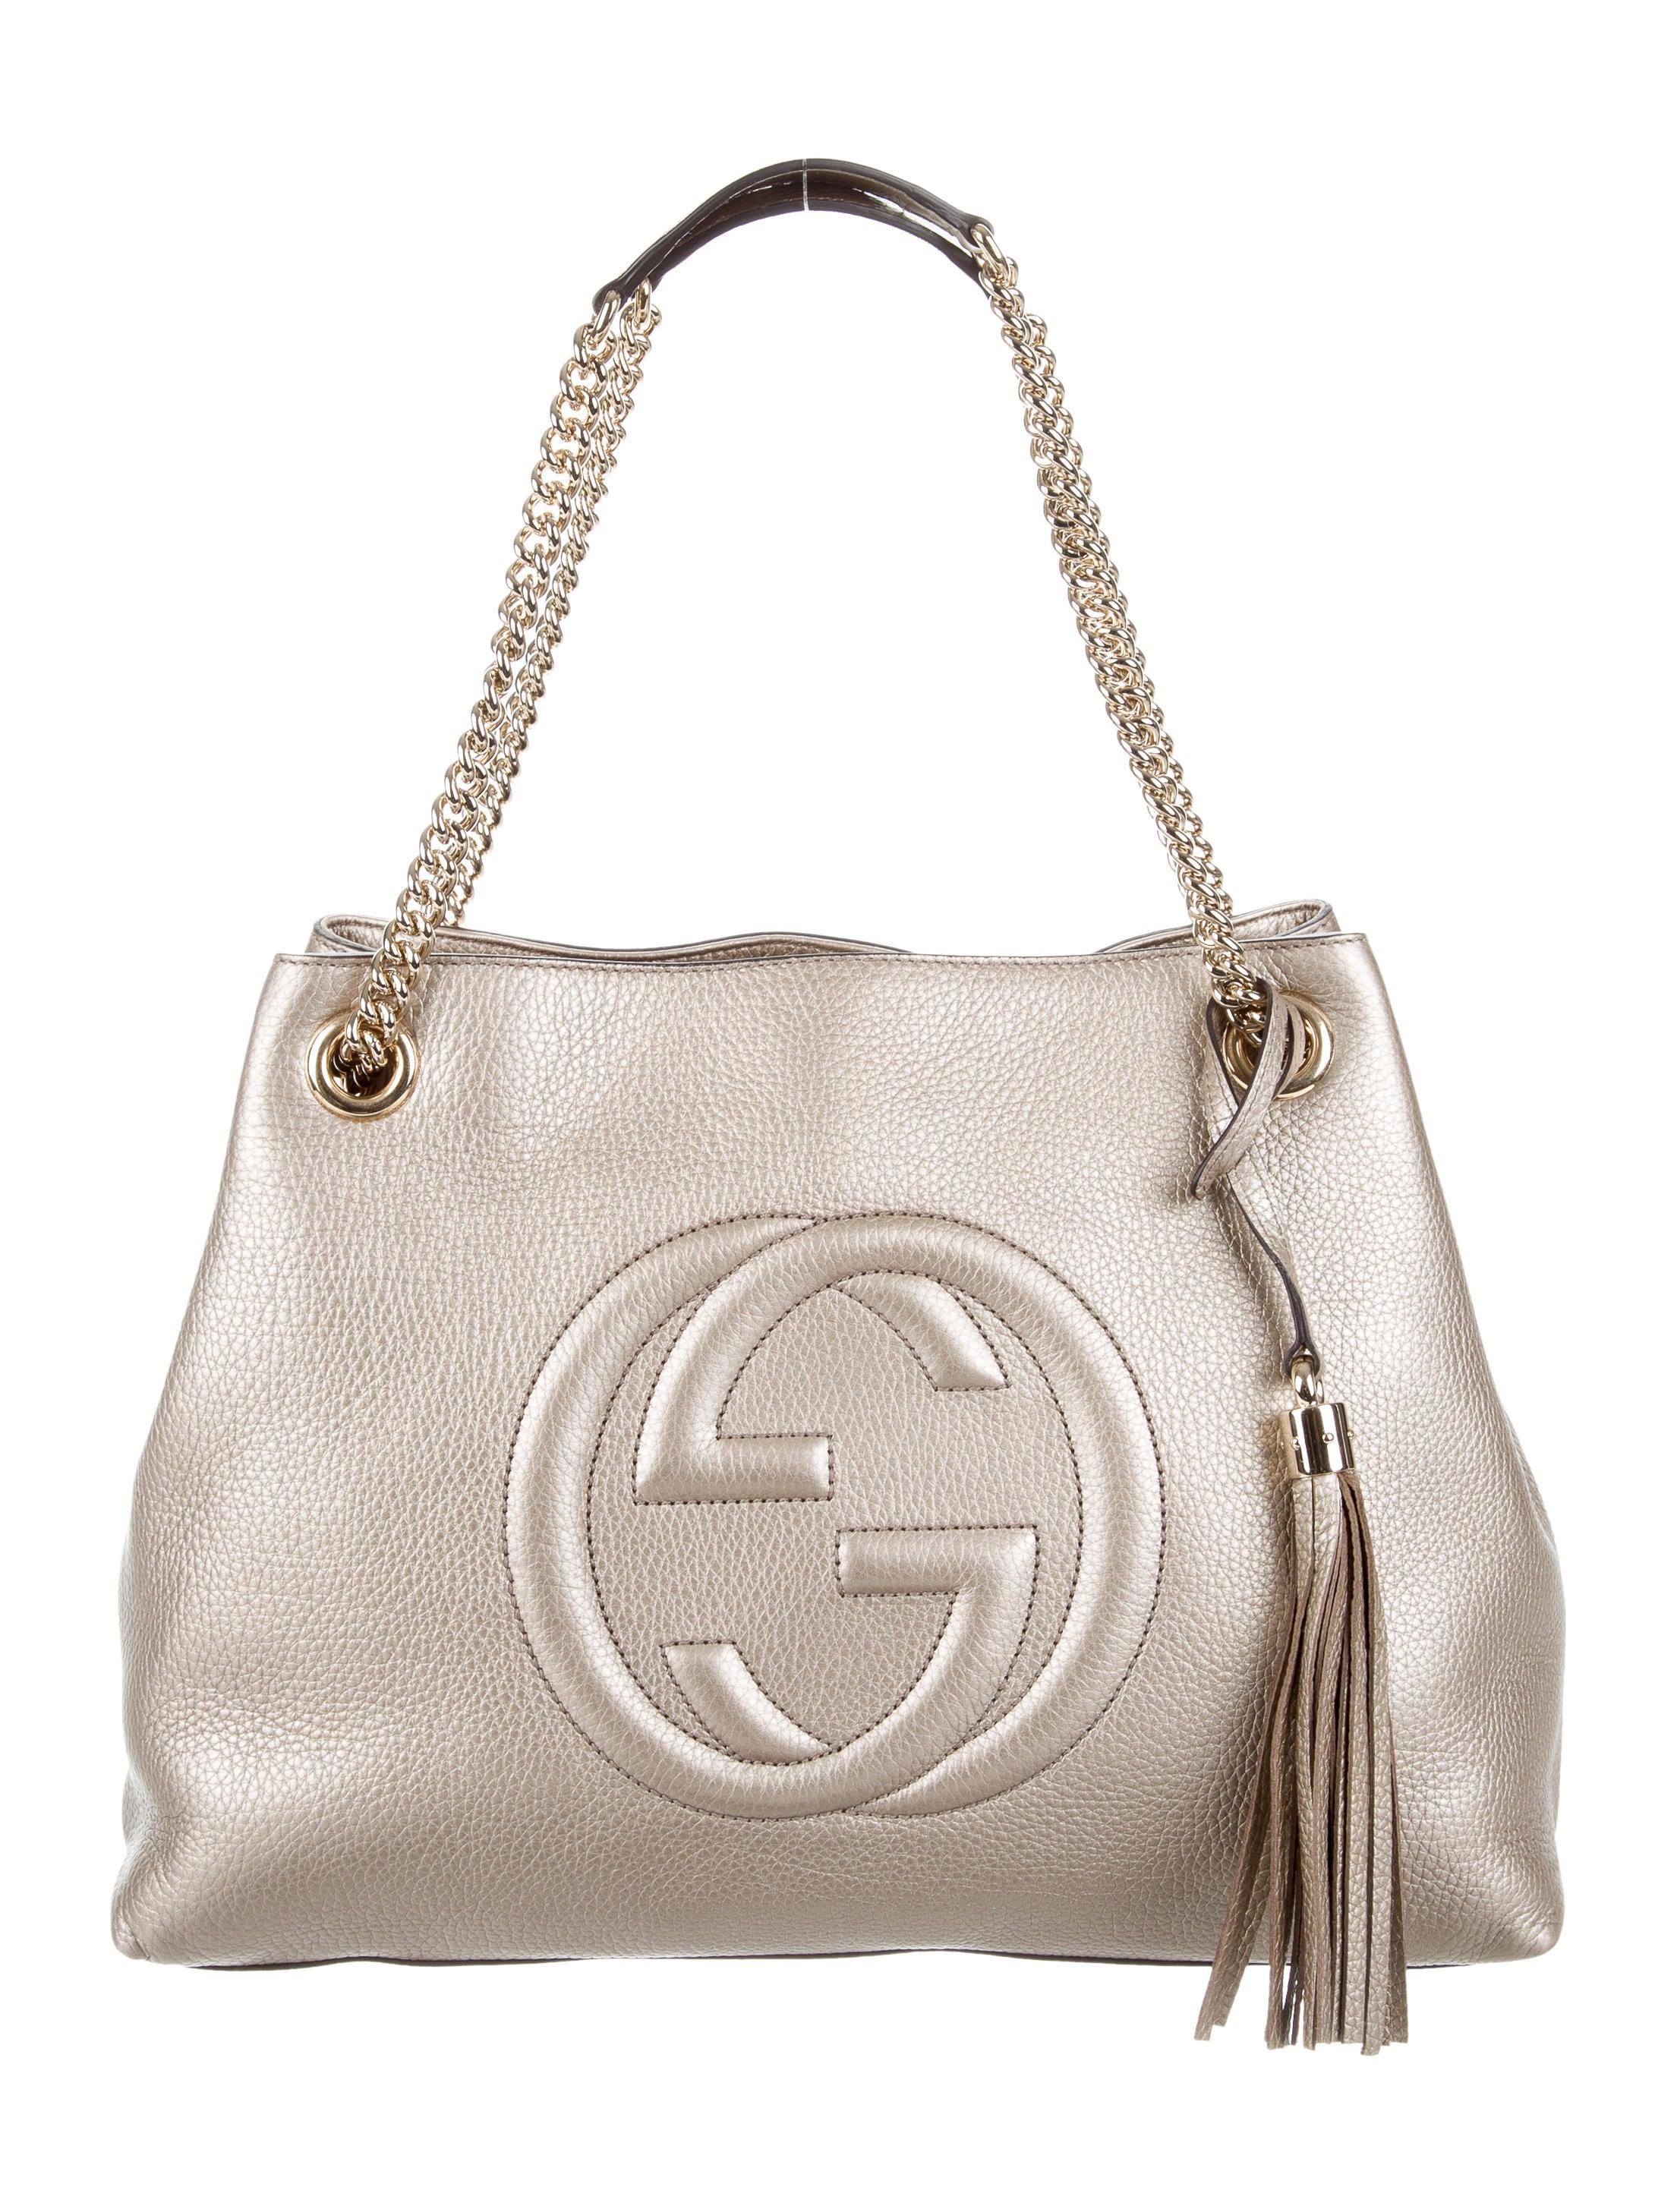 869a6397f8ab Gucci Medium Shoulder Bag 527857 | Stanford Center for Opportunity ...